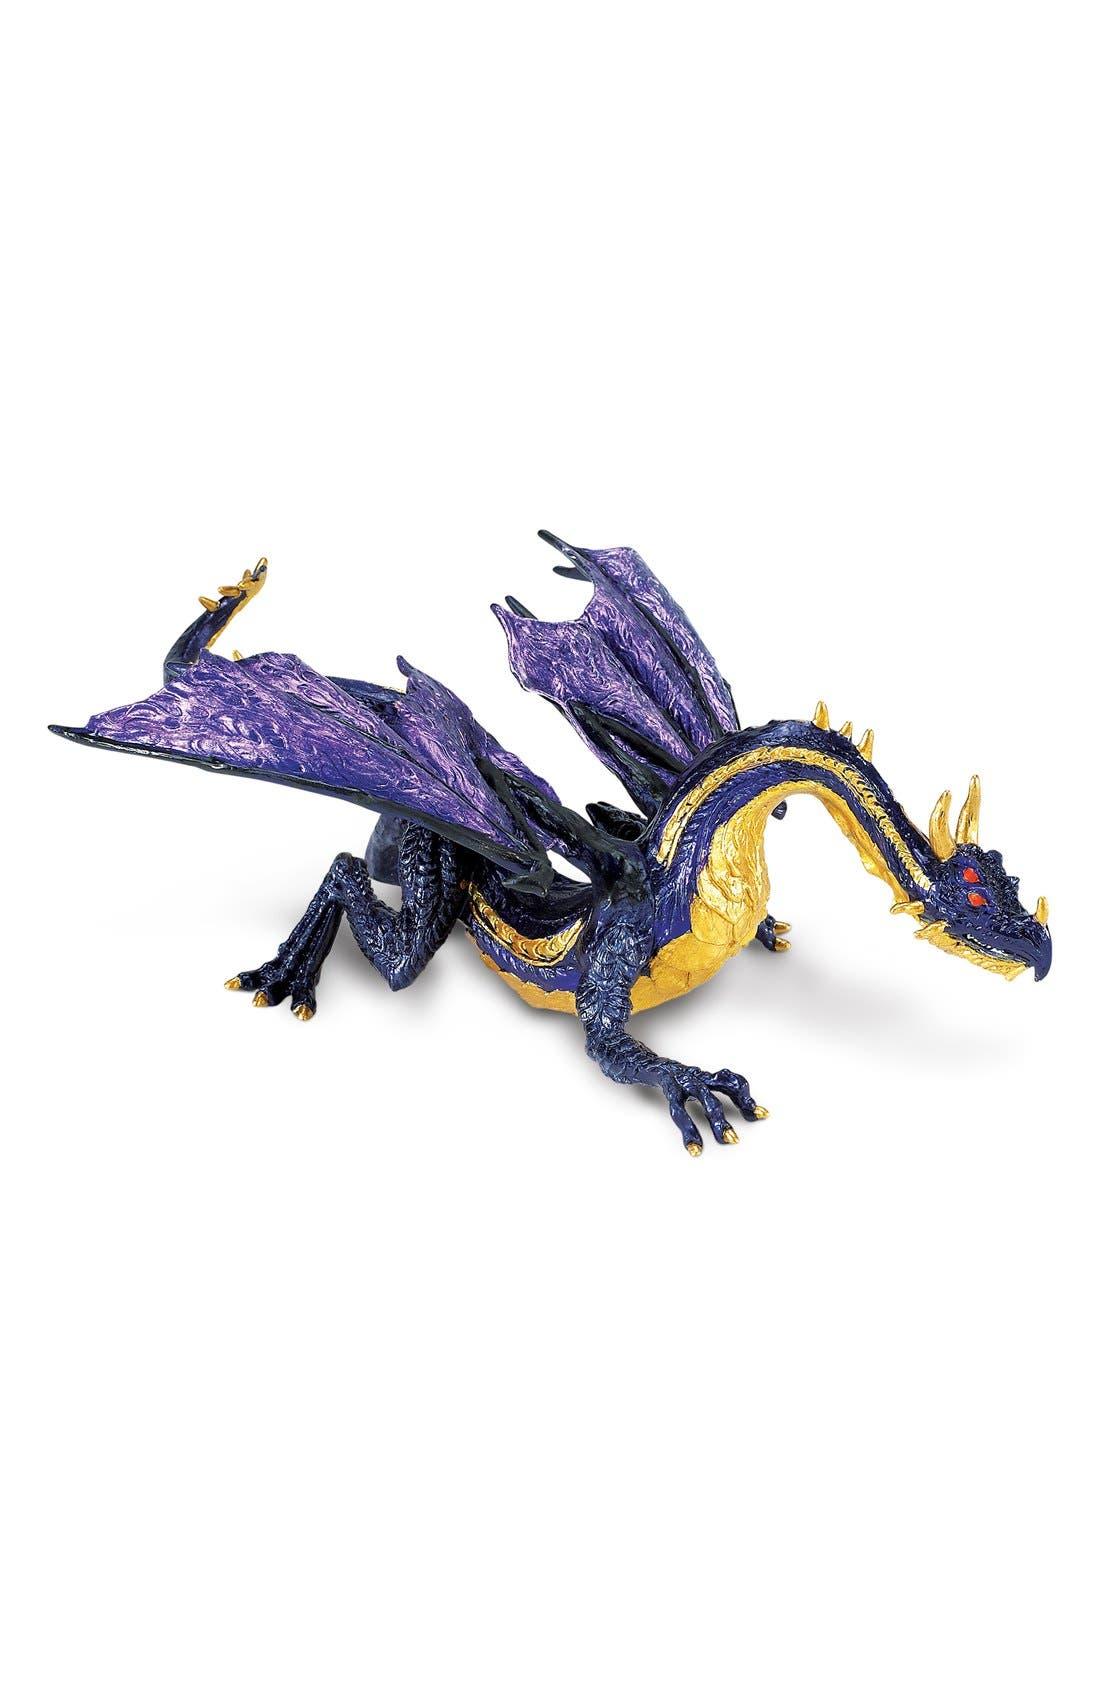 Safari Ltd. Midnight Moon Dragon Figurine